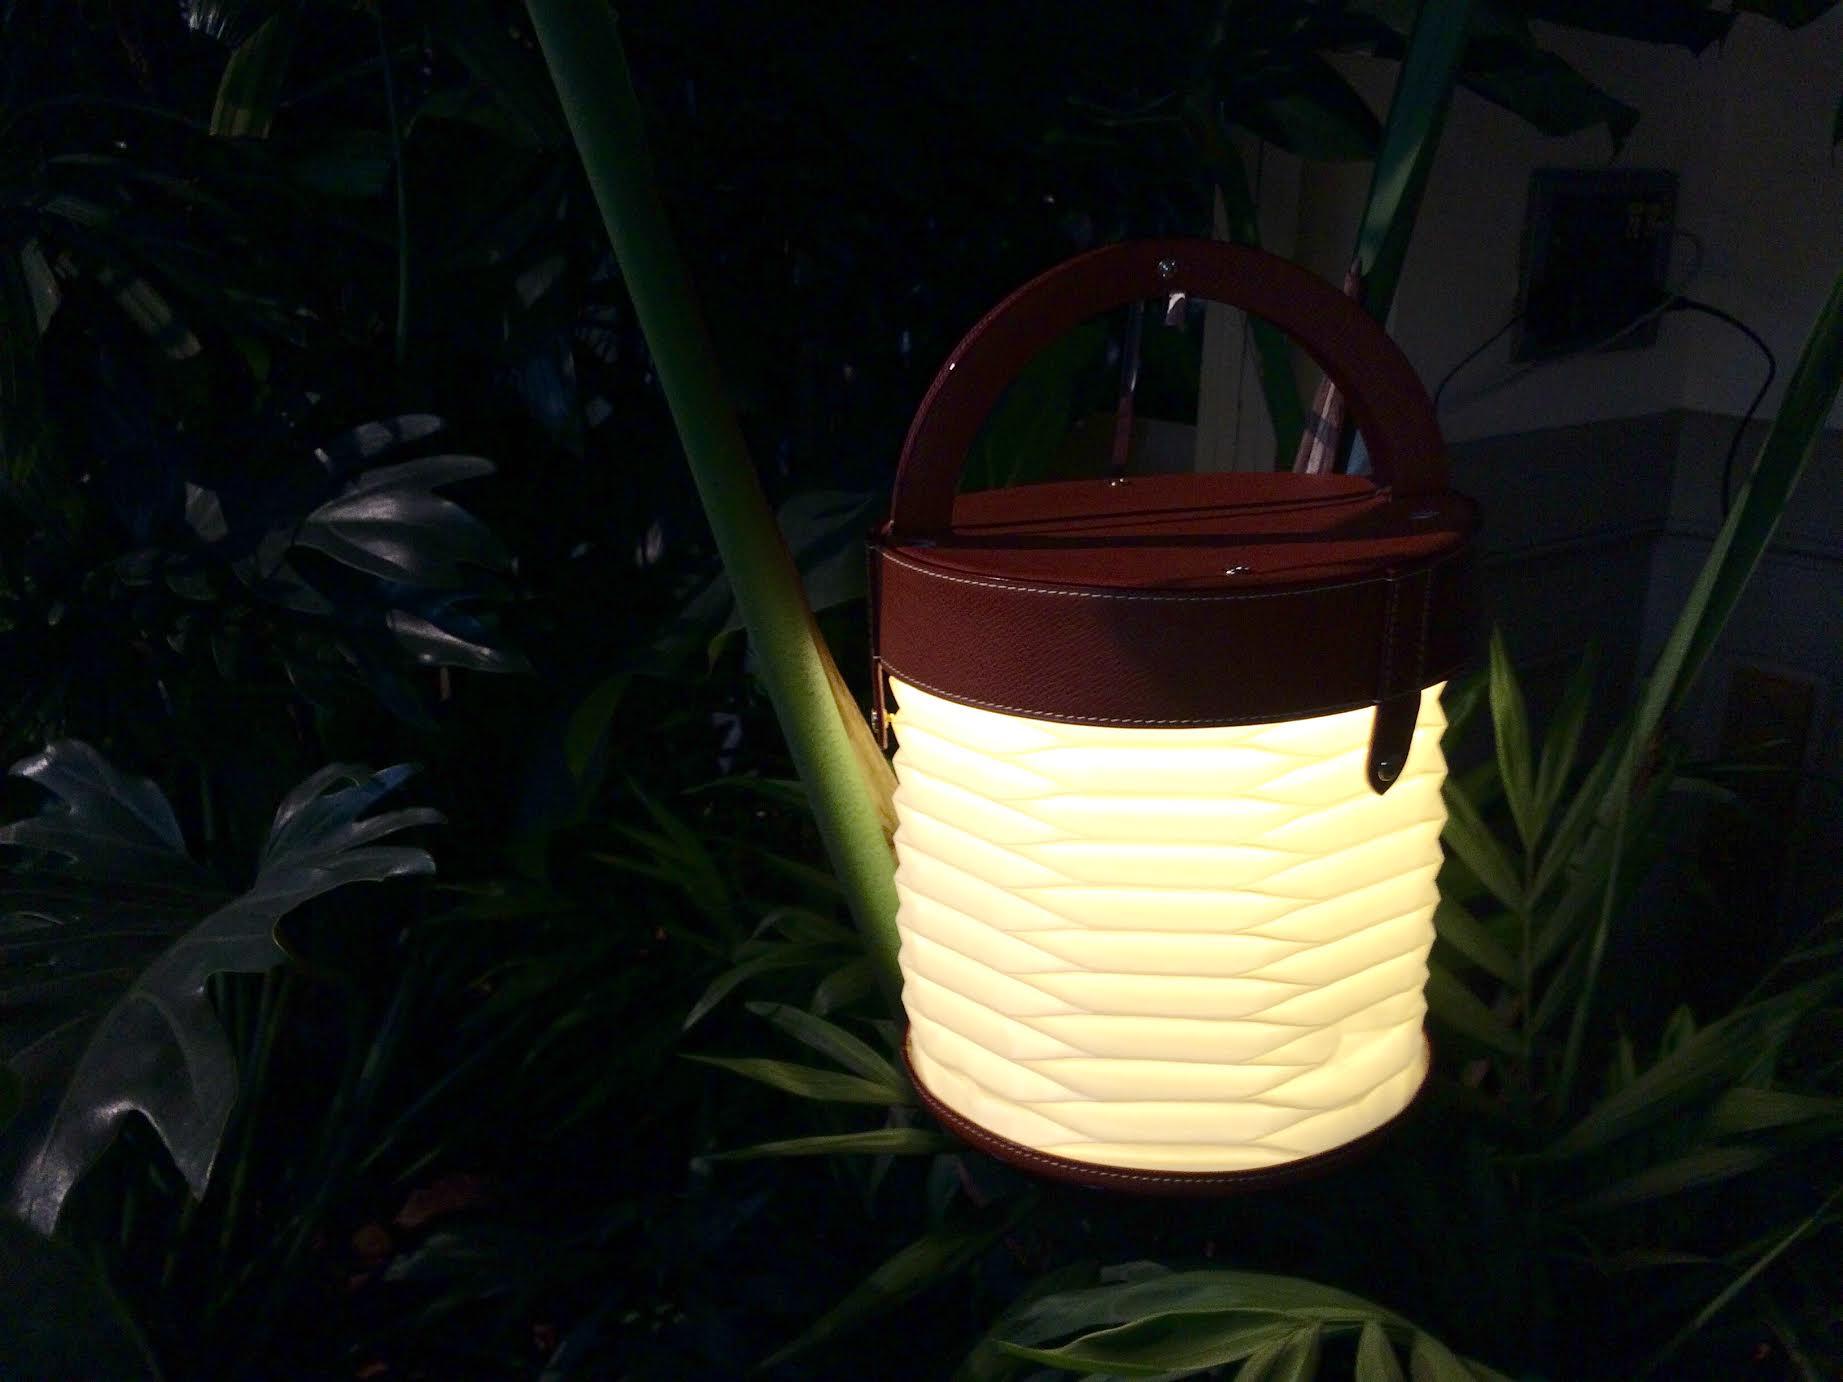 Foldable lantern by Gwenaël Nicola